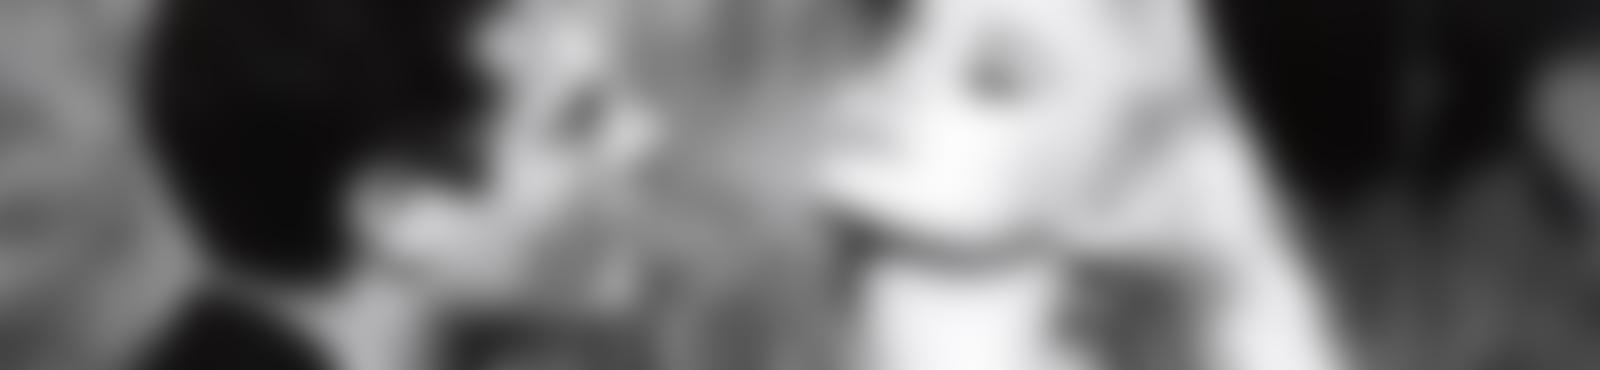 Blurred ab873301 4b0f 4b94 8640 b06b5256088e